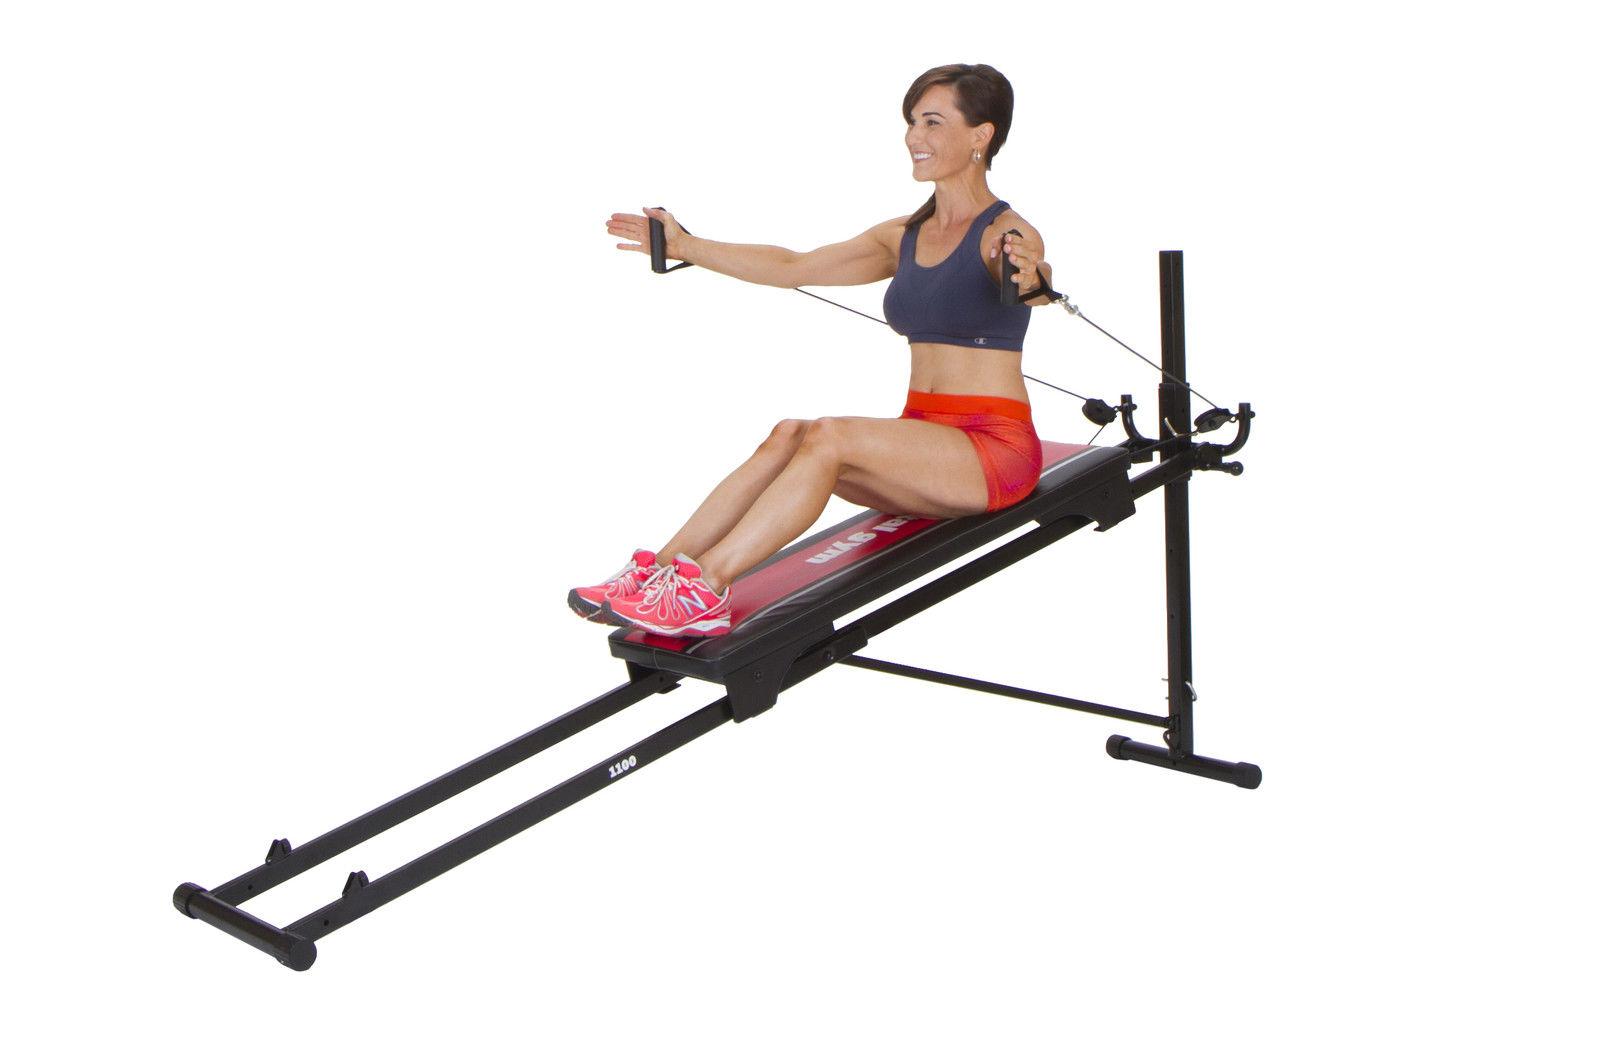 total gym 1100 exercises pdf